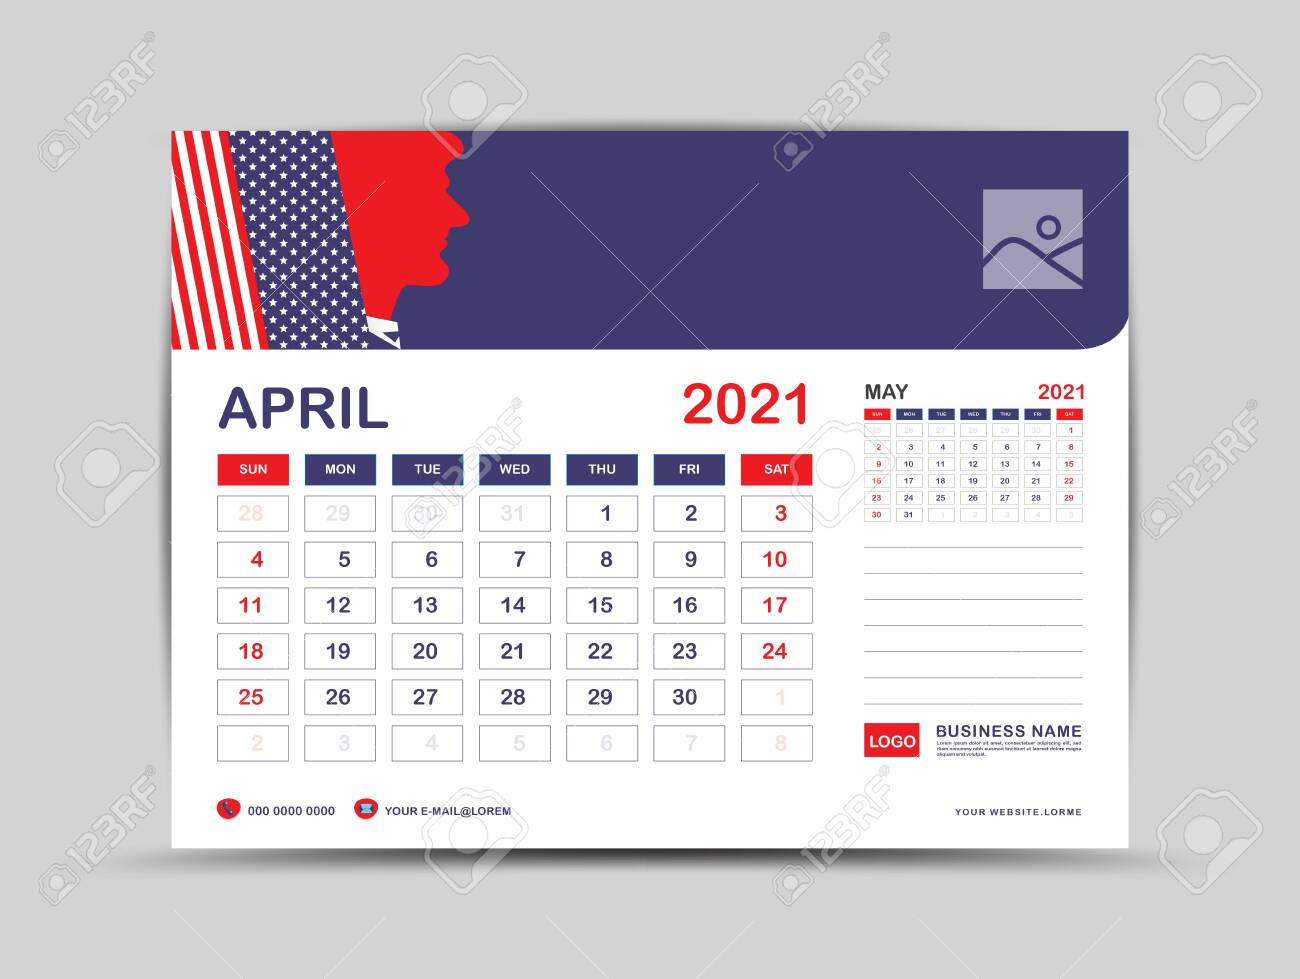 Photo Desk Calendar 2021 Desk Calendar 2021 Template, April Page Vector For Calendar 2021